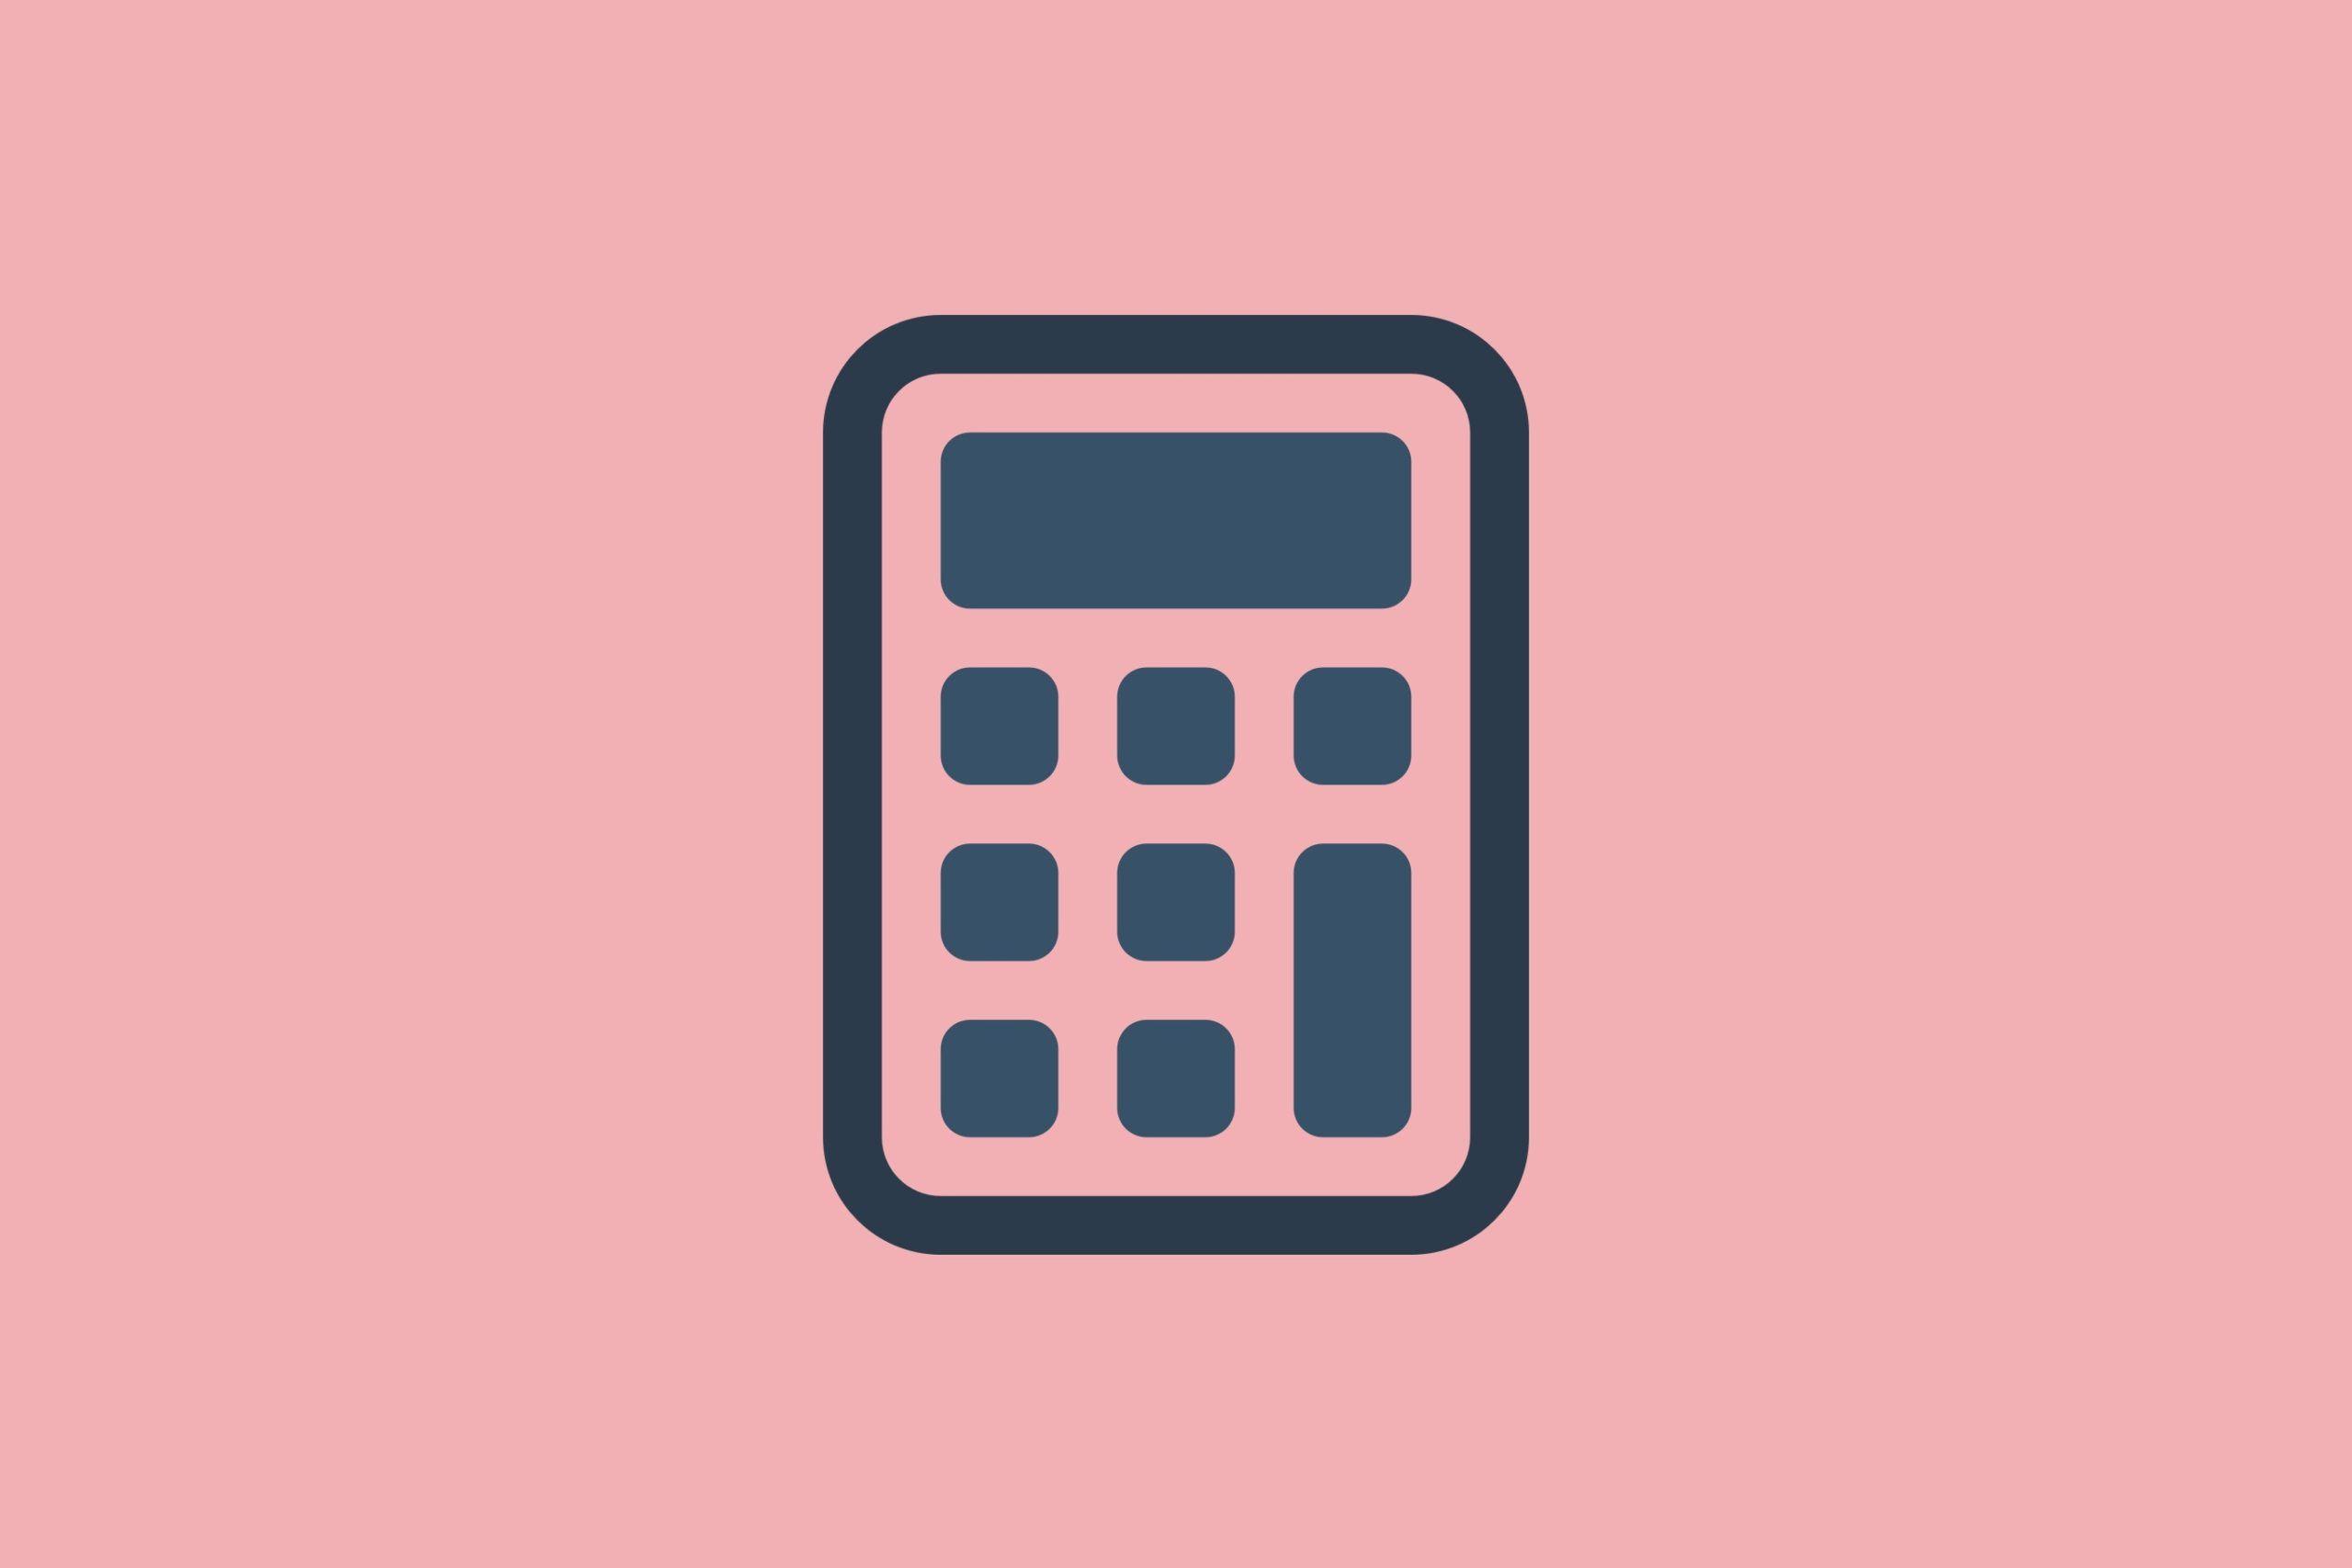 illustration of a calculator